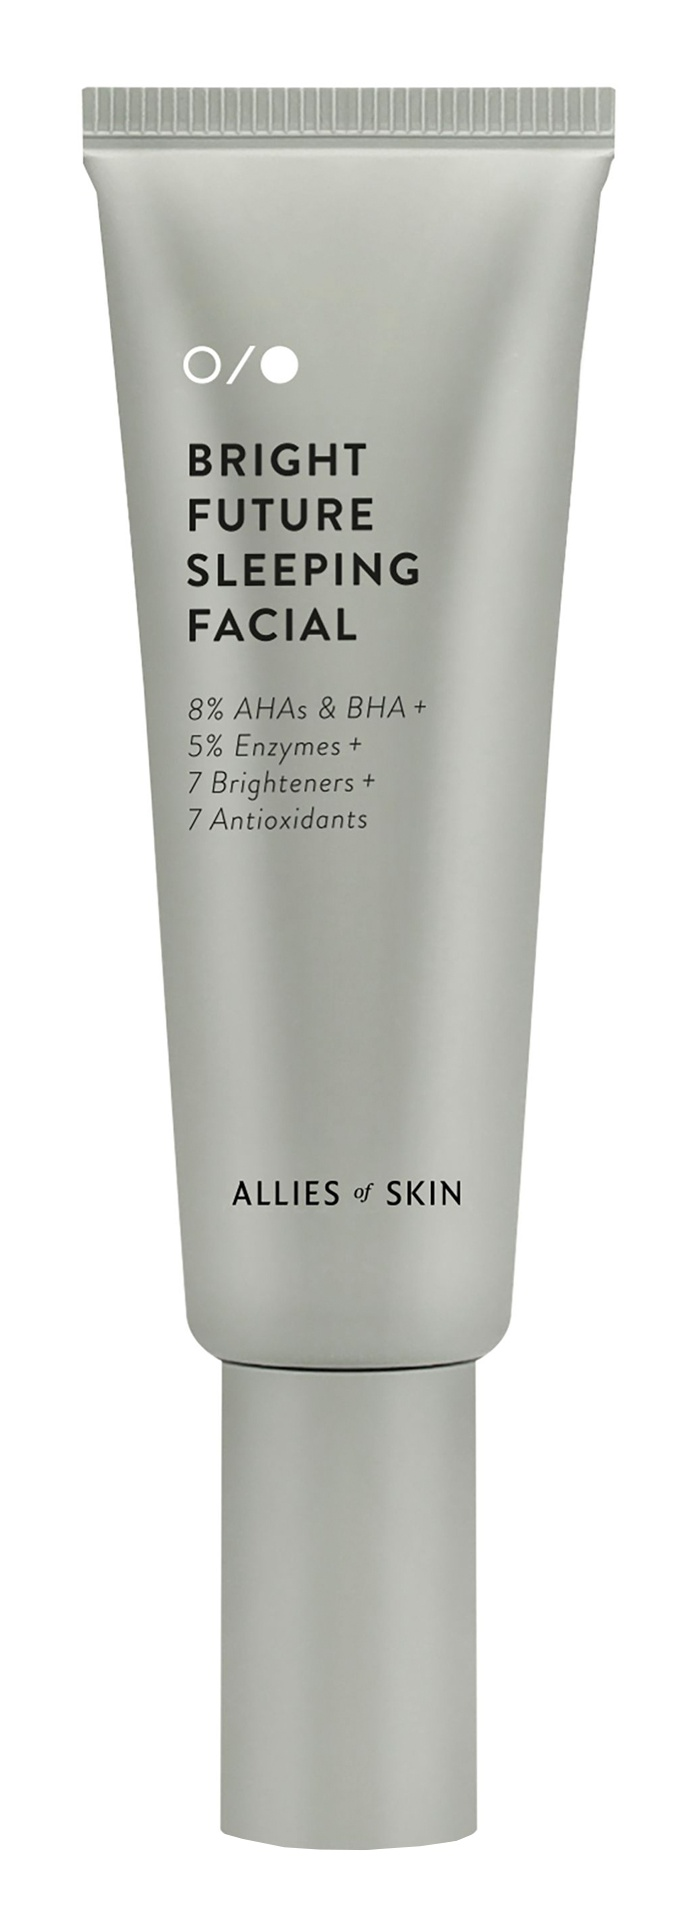 Allies of Skin Bright Future Sleeping Facial